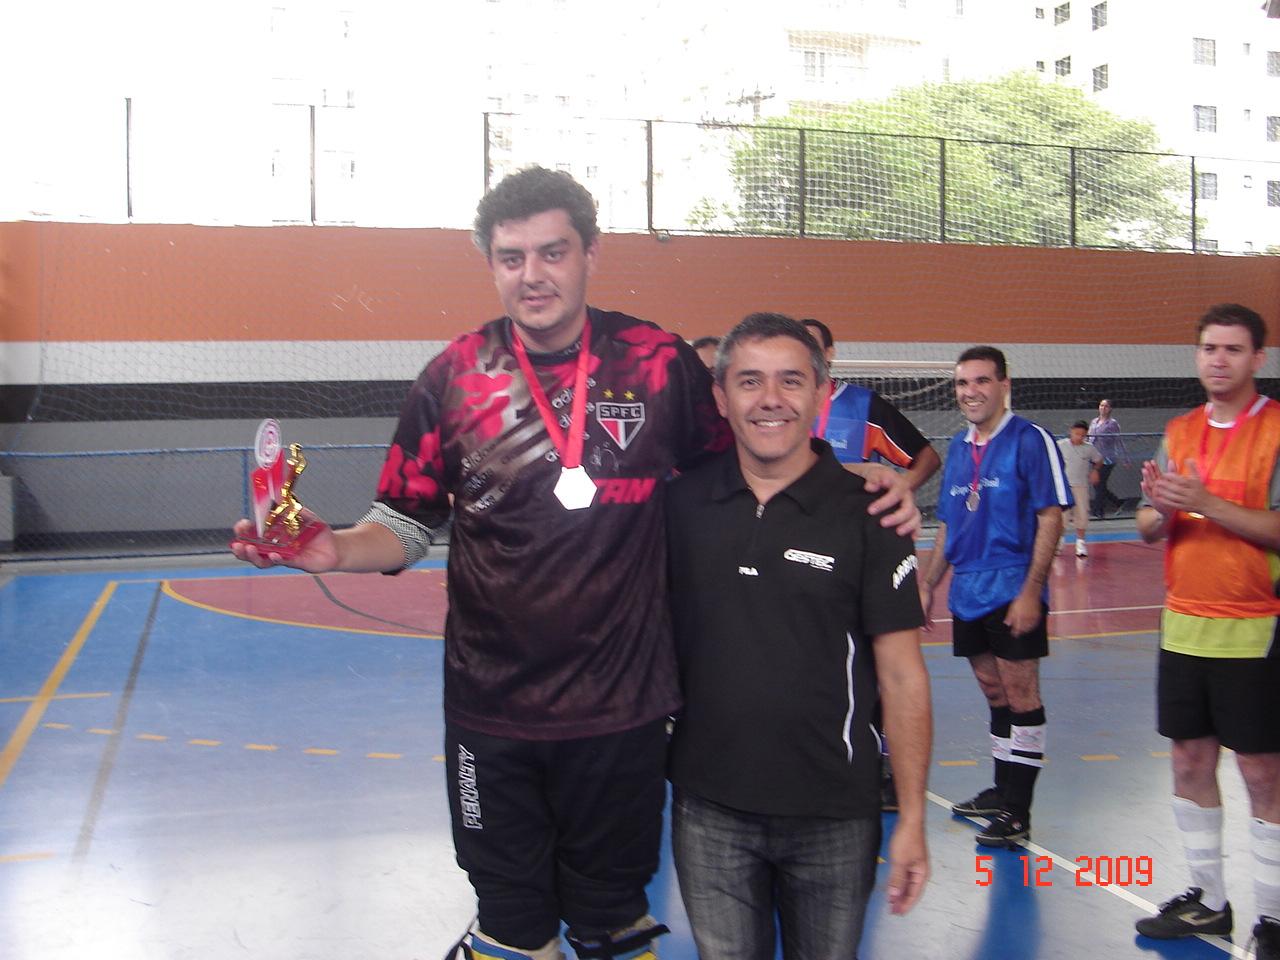 Destaque - Marcelo Tirelli da equipe Anchieta recebendo troféu de Marlei da GESTEC